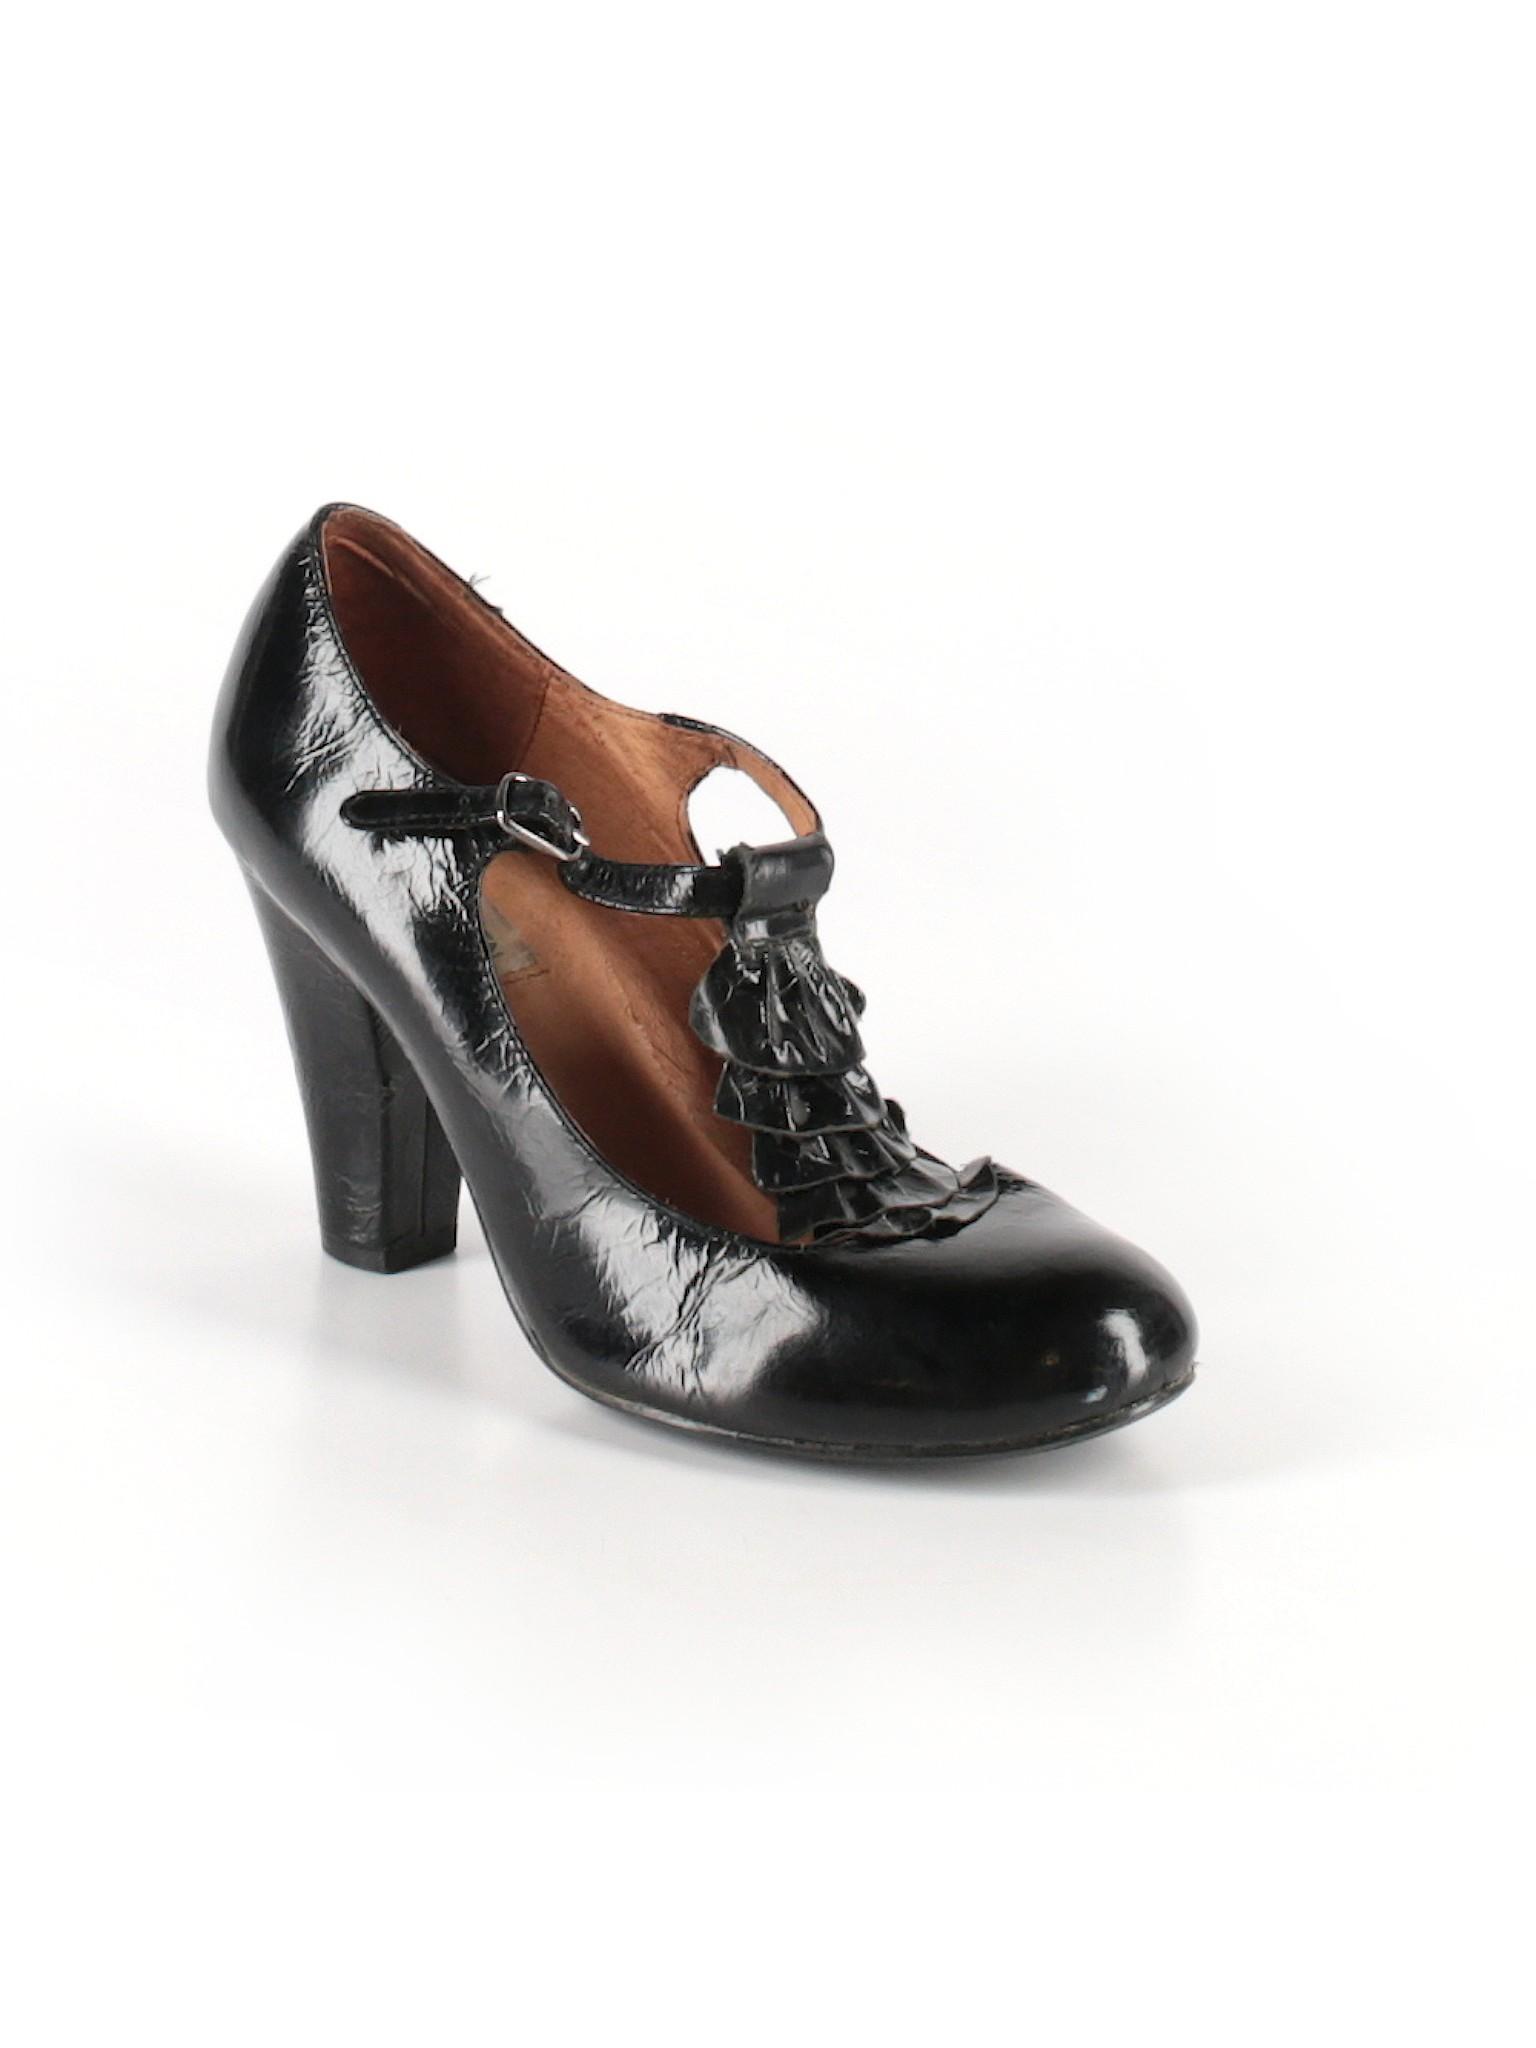 Madden Boutique Boutique Steve promotion Heels promotion q0Bg4wY